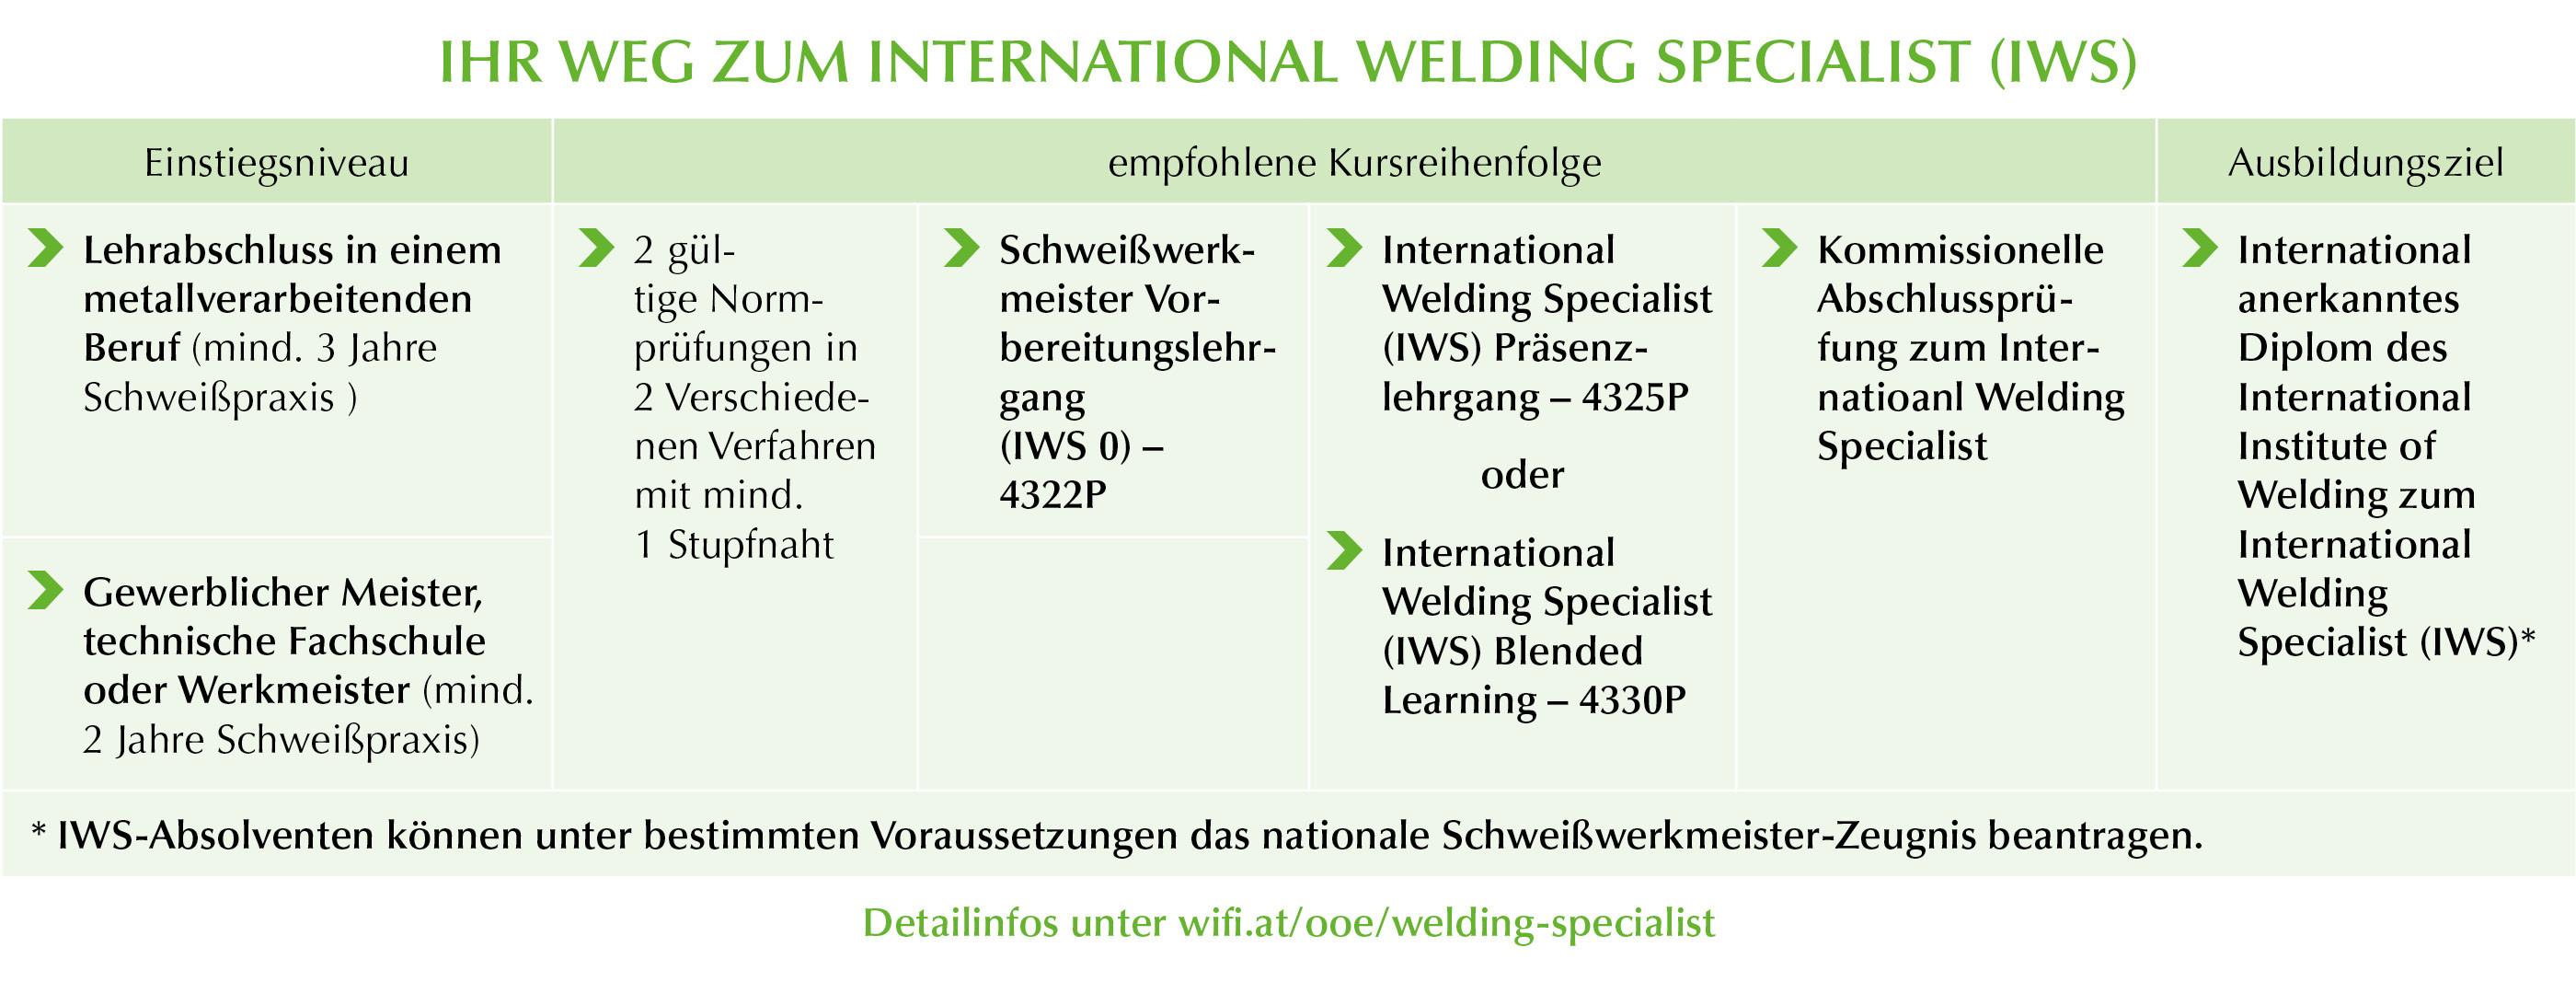 International Welding Specialist